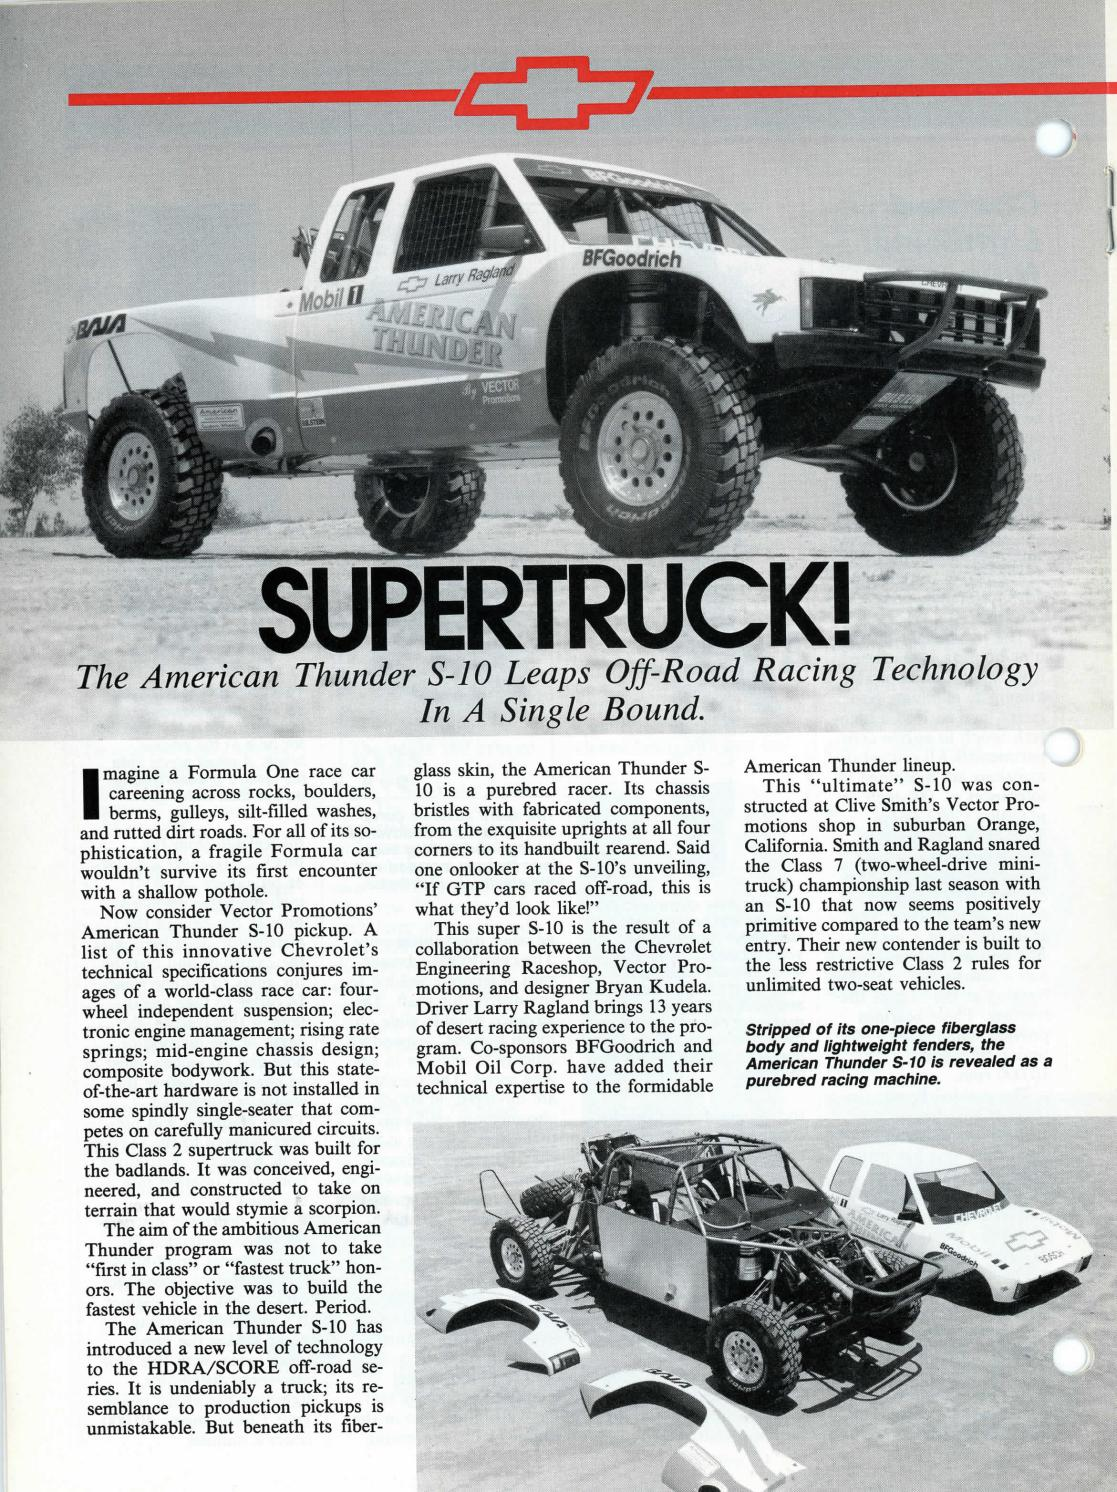 Supertruck, Chevy, 1989 by Lanternmark Industries Inc - issuu